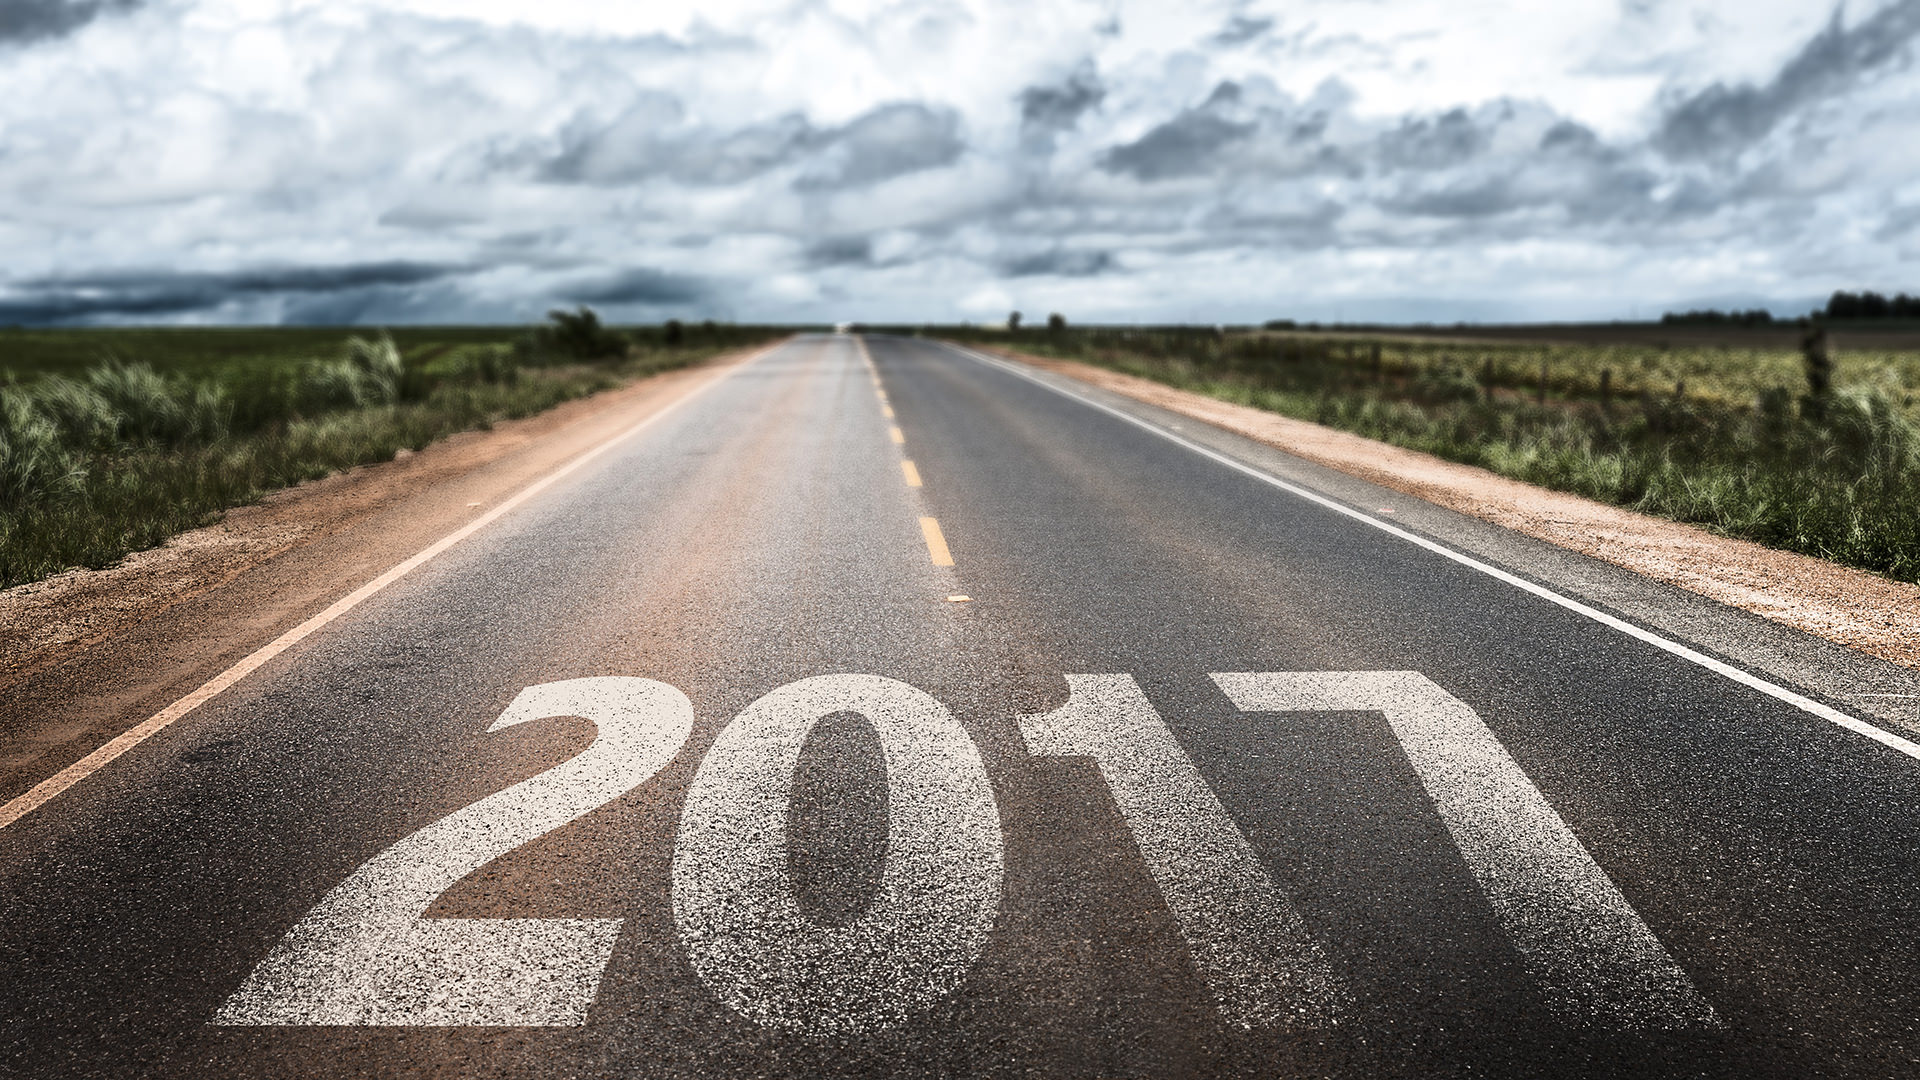 2017-future-road-ss-1920